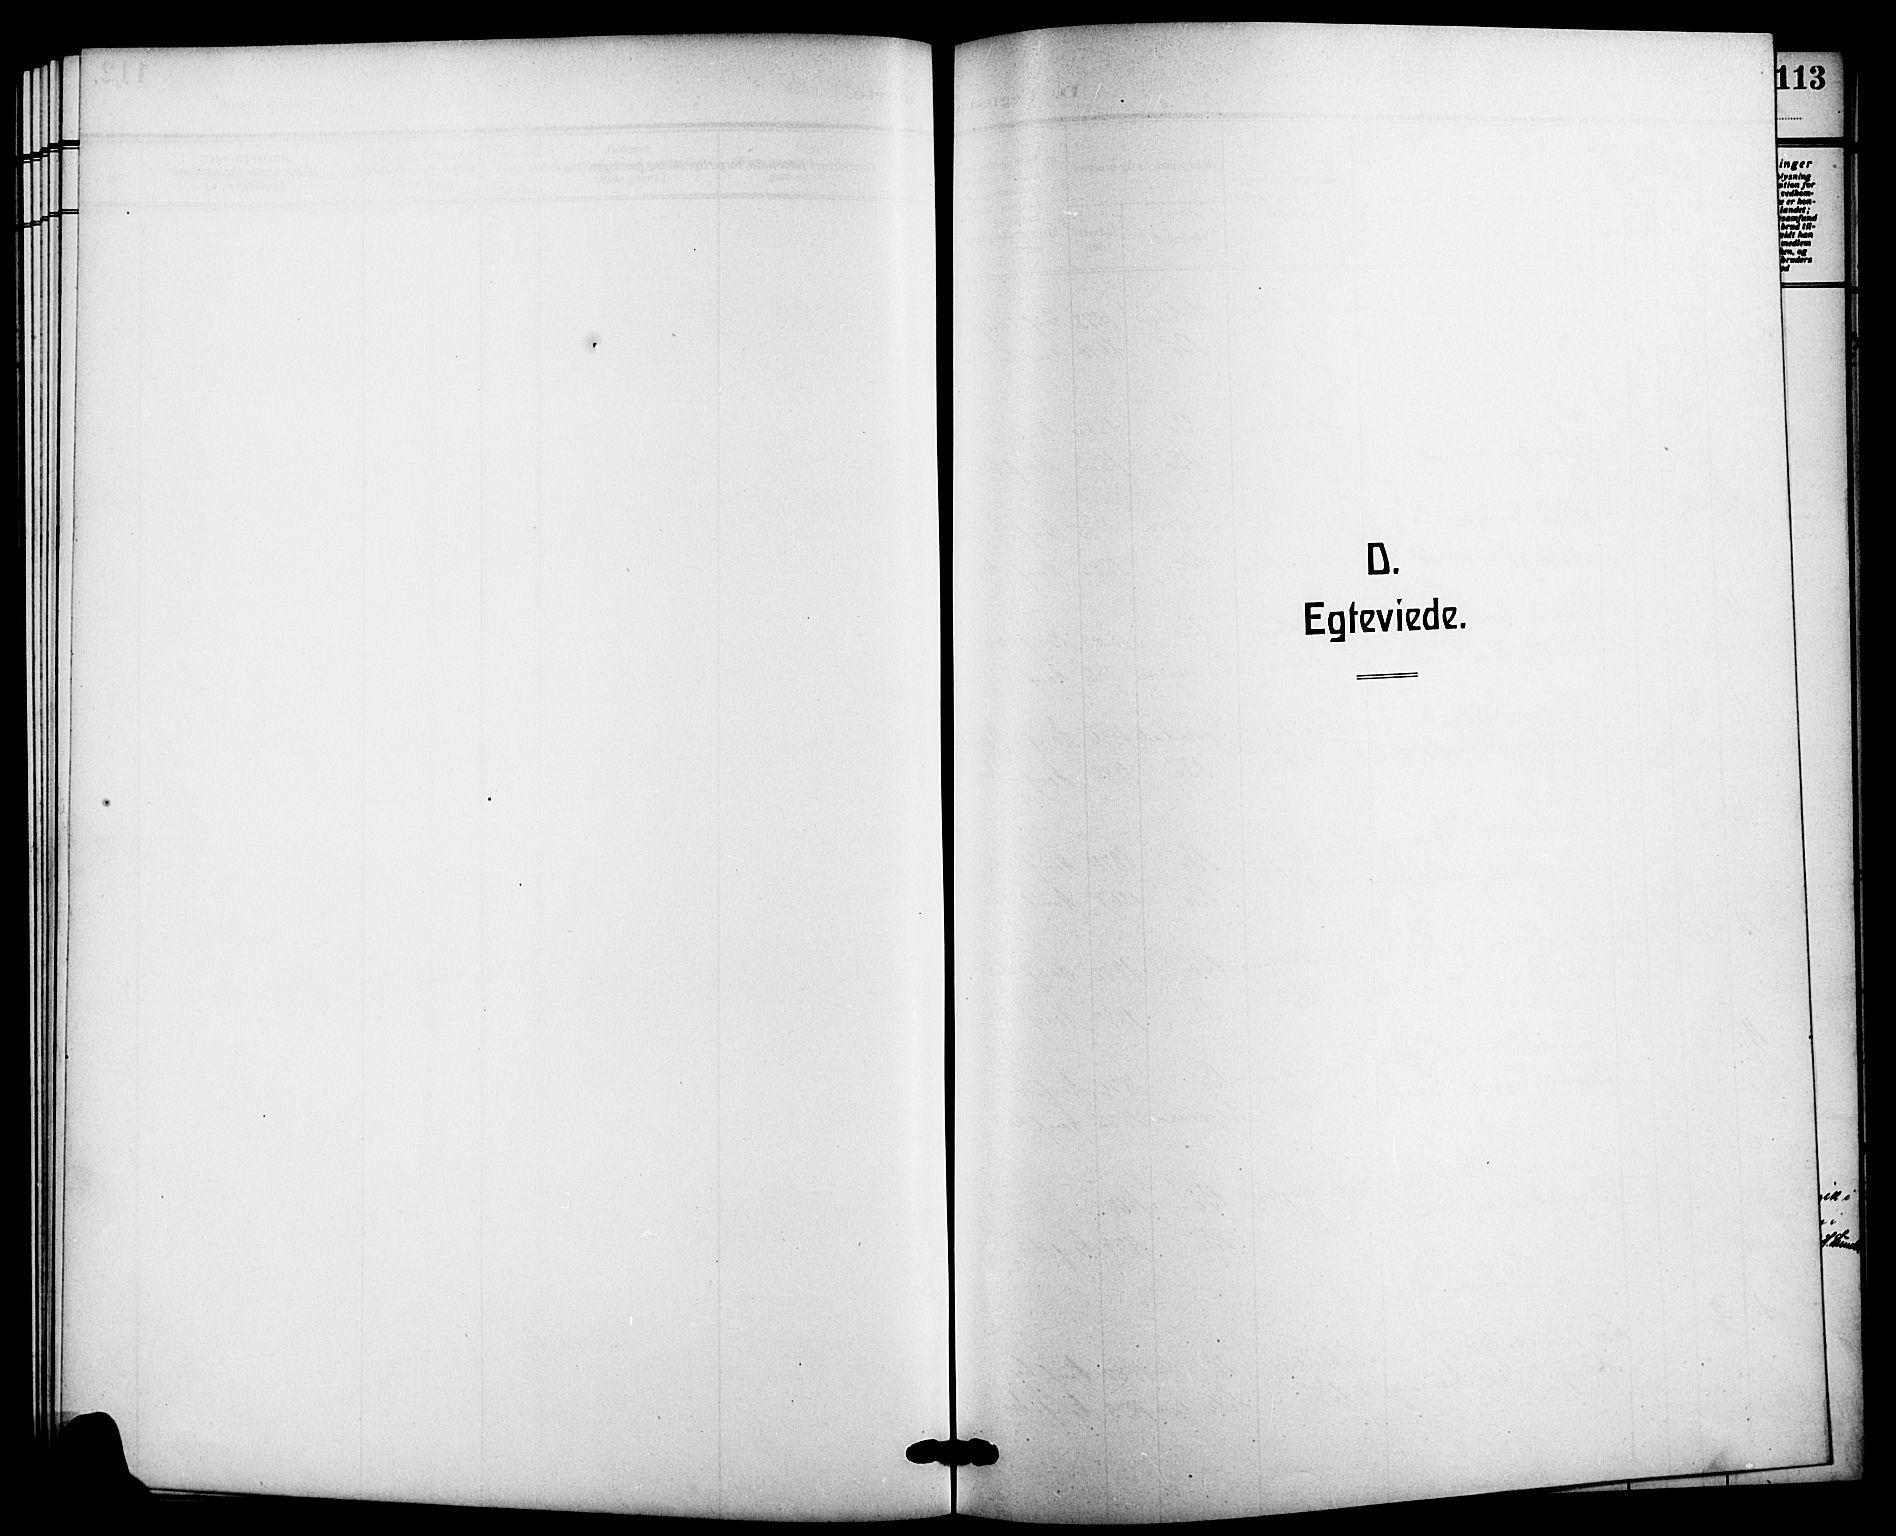 SAKO, Bø kirkebøker, G/Ga/L0007: Klokkerbok nr. 7, 1909-1924